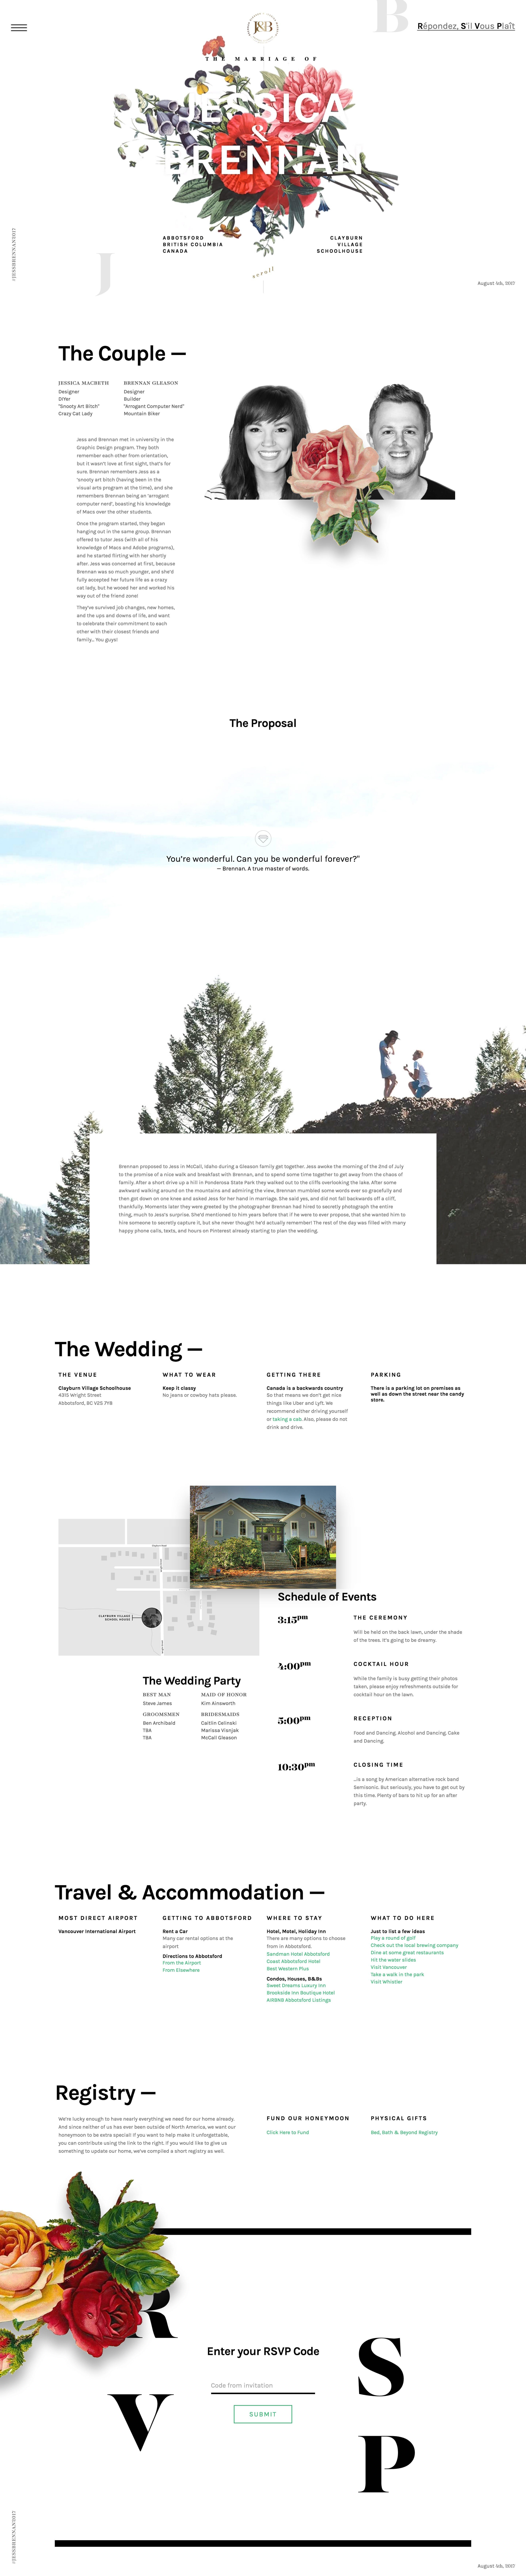 The Wedding of Jessica and Brennan Website Screenshot